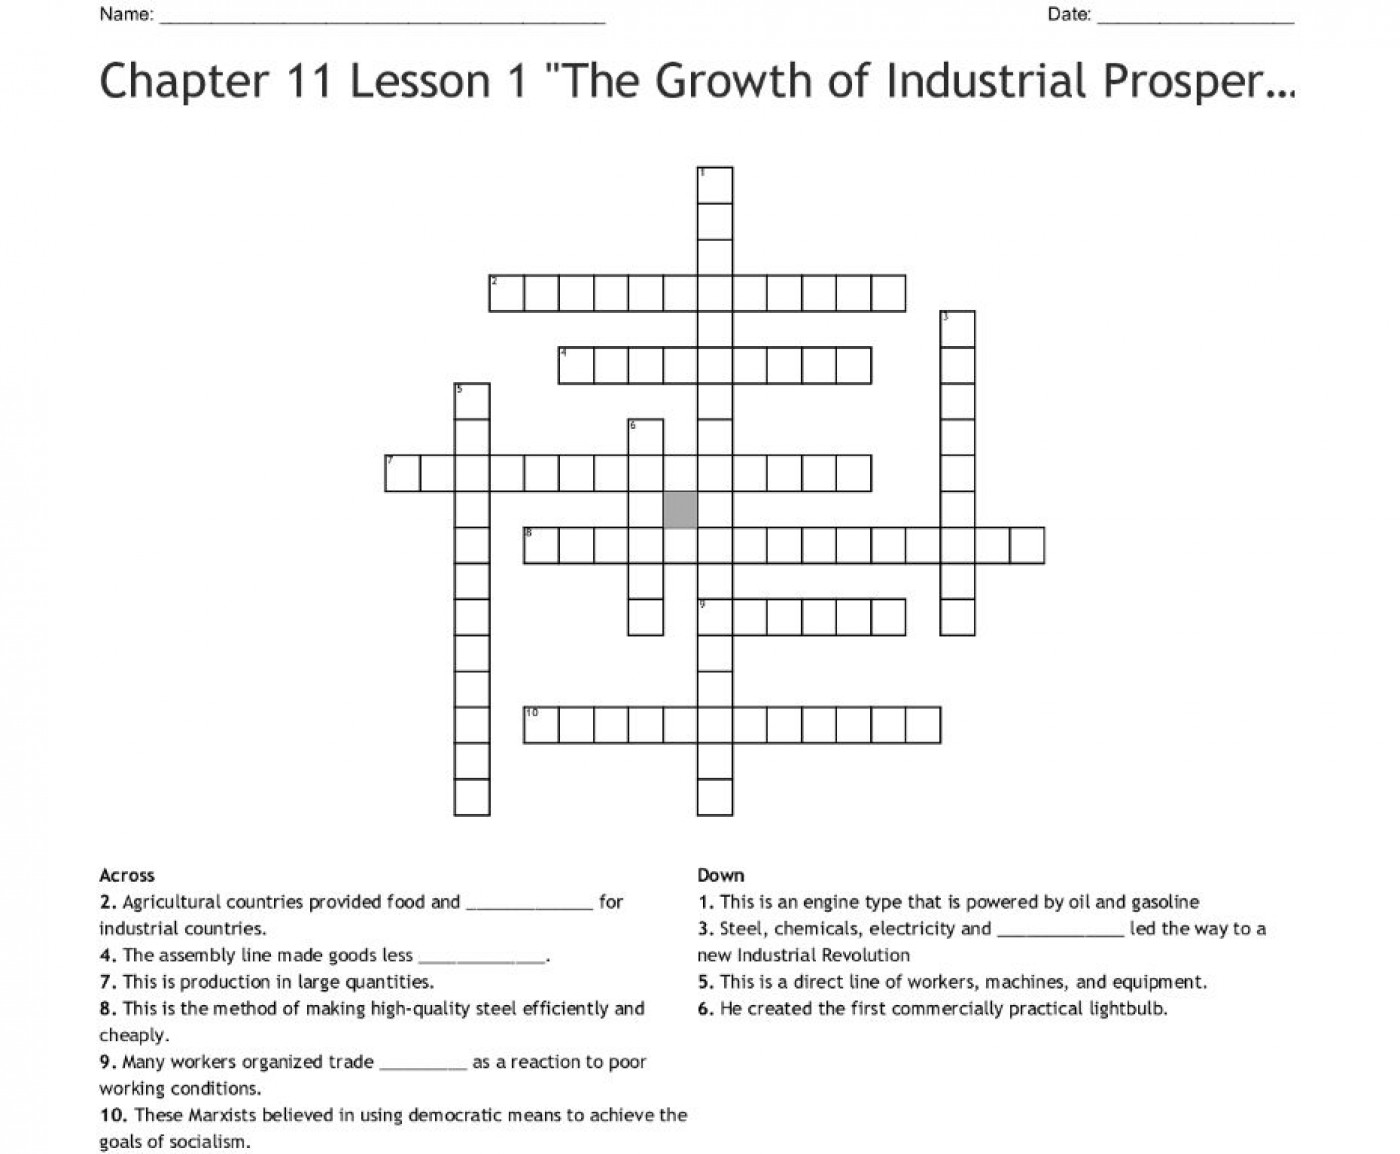 000 Unbelievable Prosperity Crossword Design  National Economic Clue Nyt Prosperou 11 Letter 101400